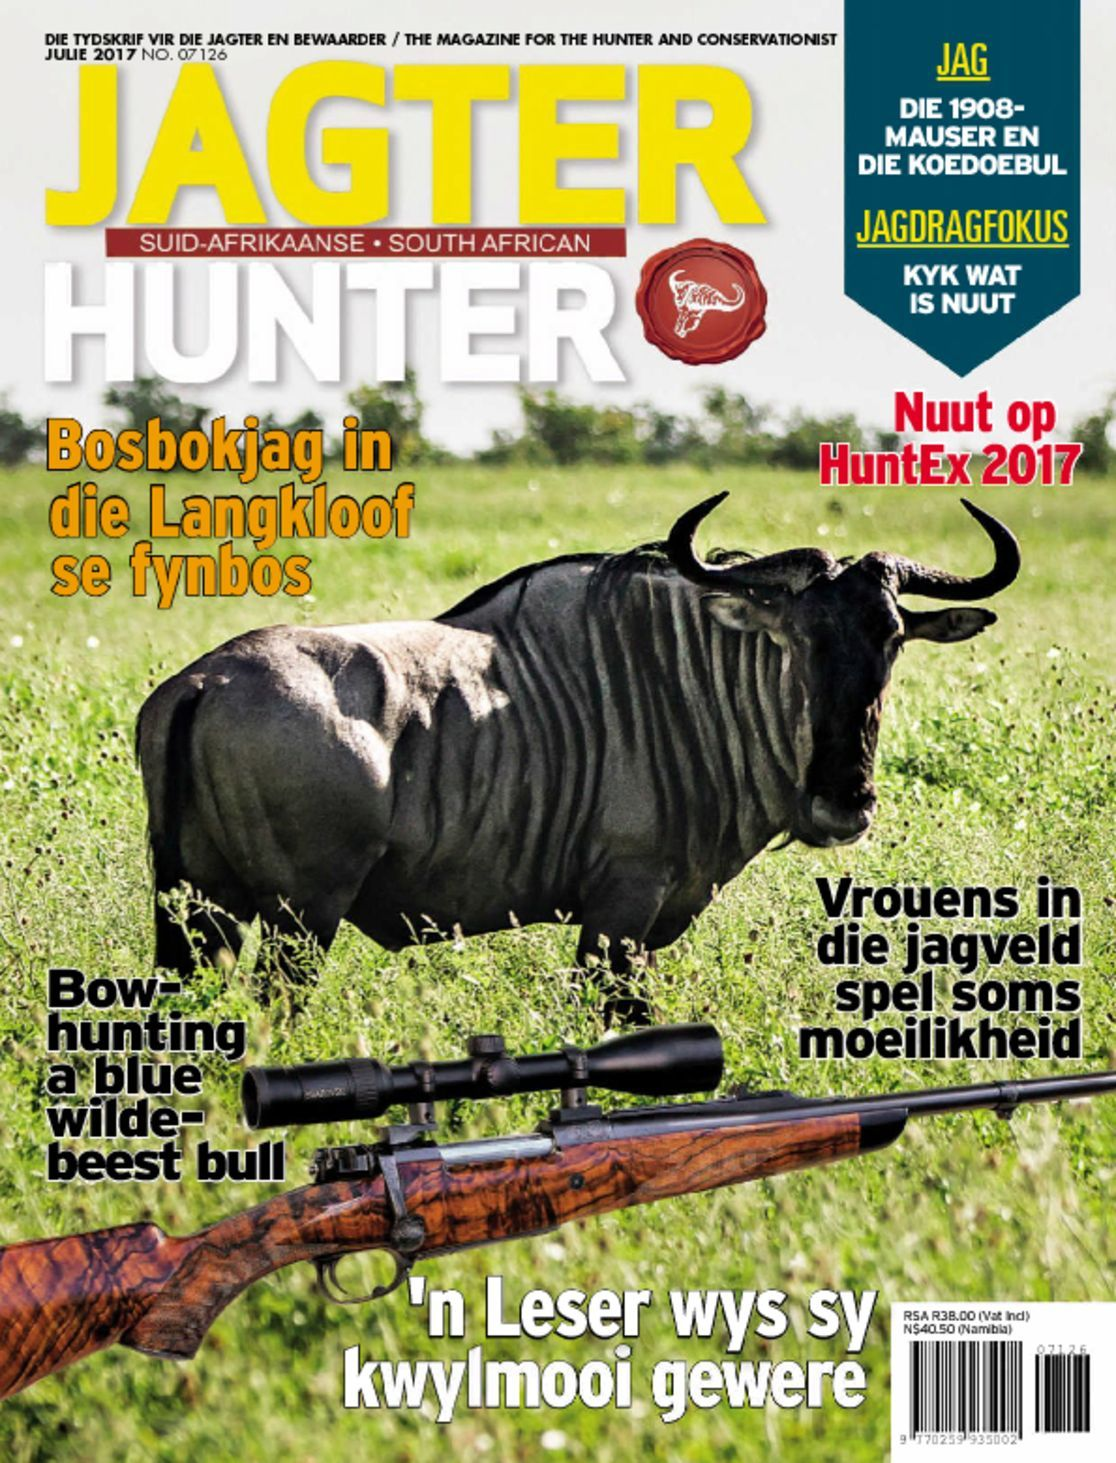 Sa hunter jagter magazine digital for Sa fishing promo code free shipping